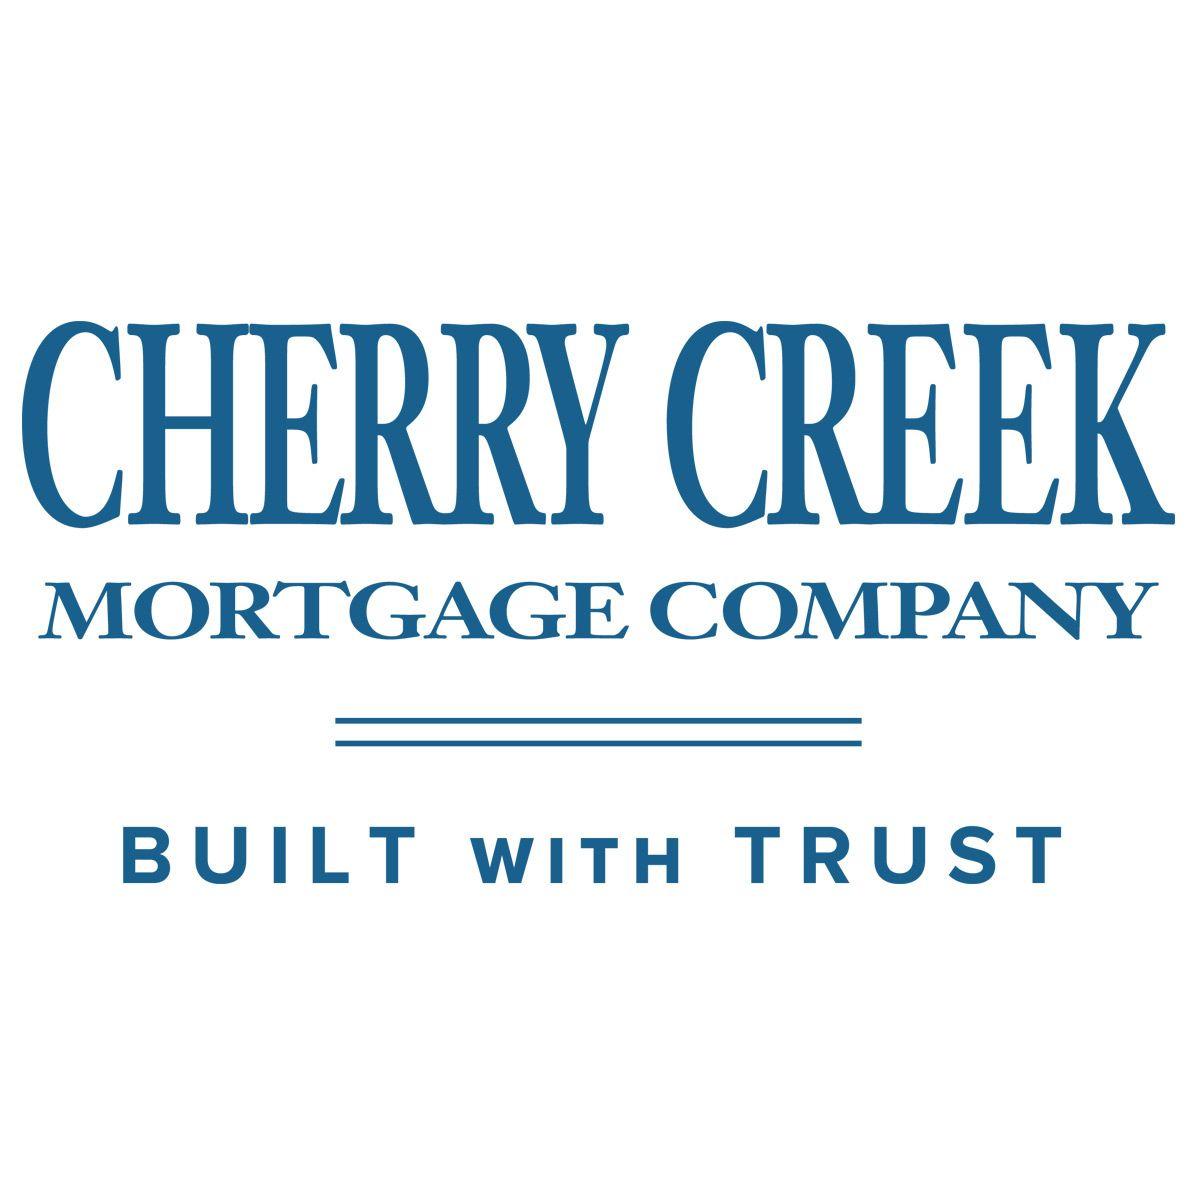 Cherry Creek Mortgage Company - Fox Cities Coupons near me ...